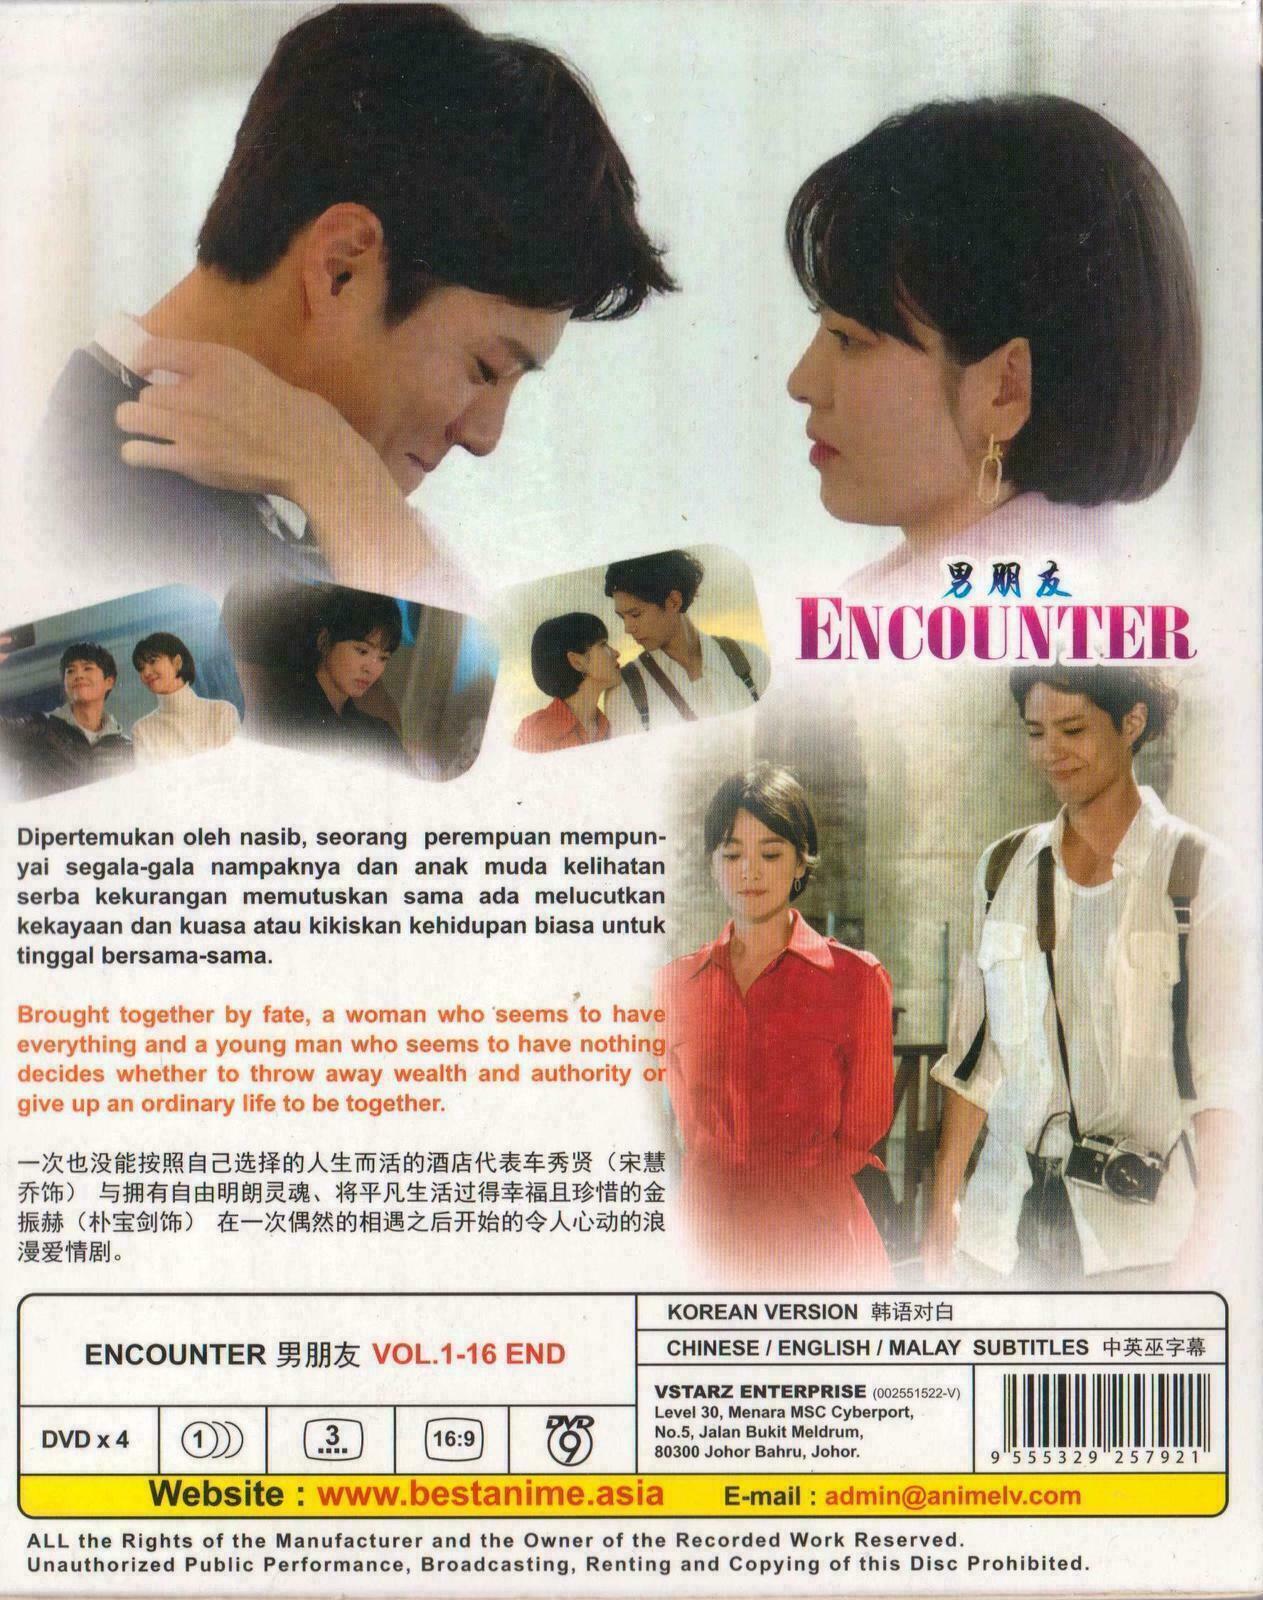 Korean Drama Encounter Dvd -English Subtitle Ship From USA